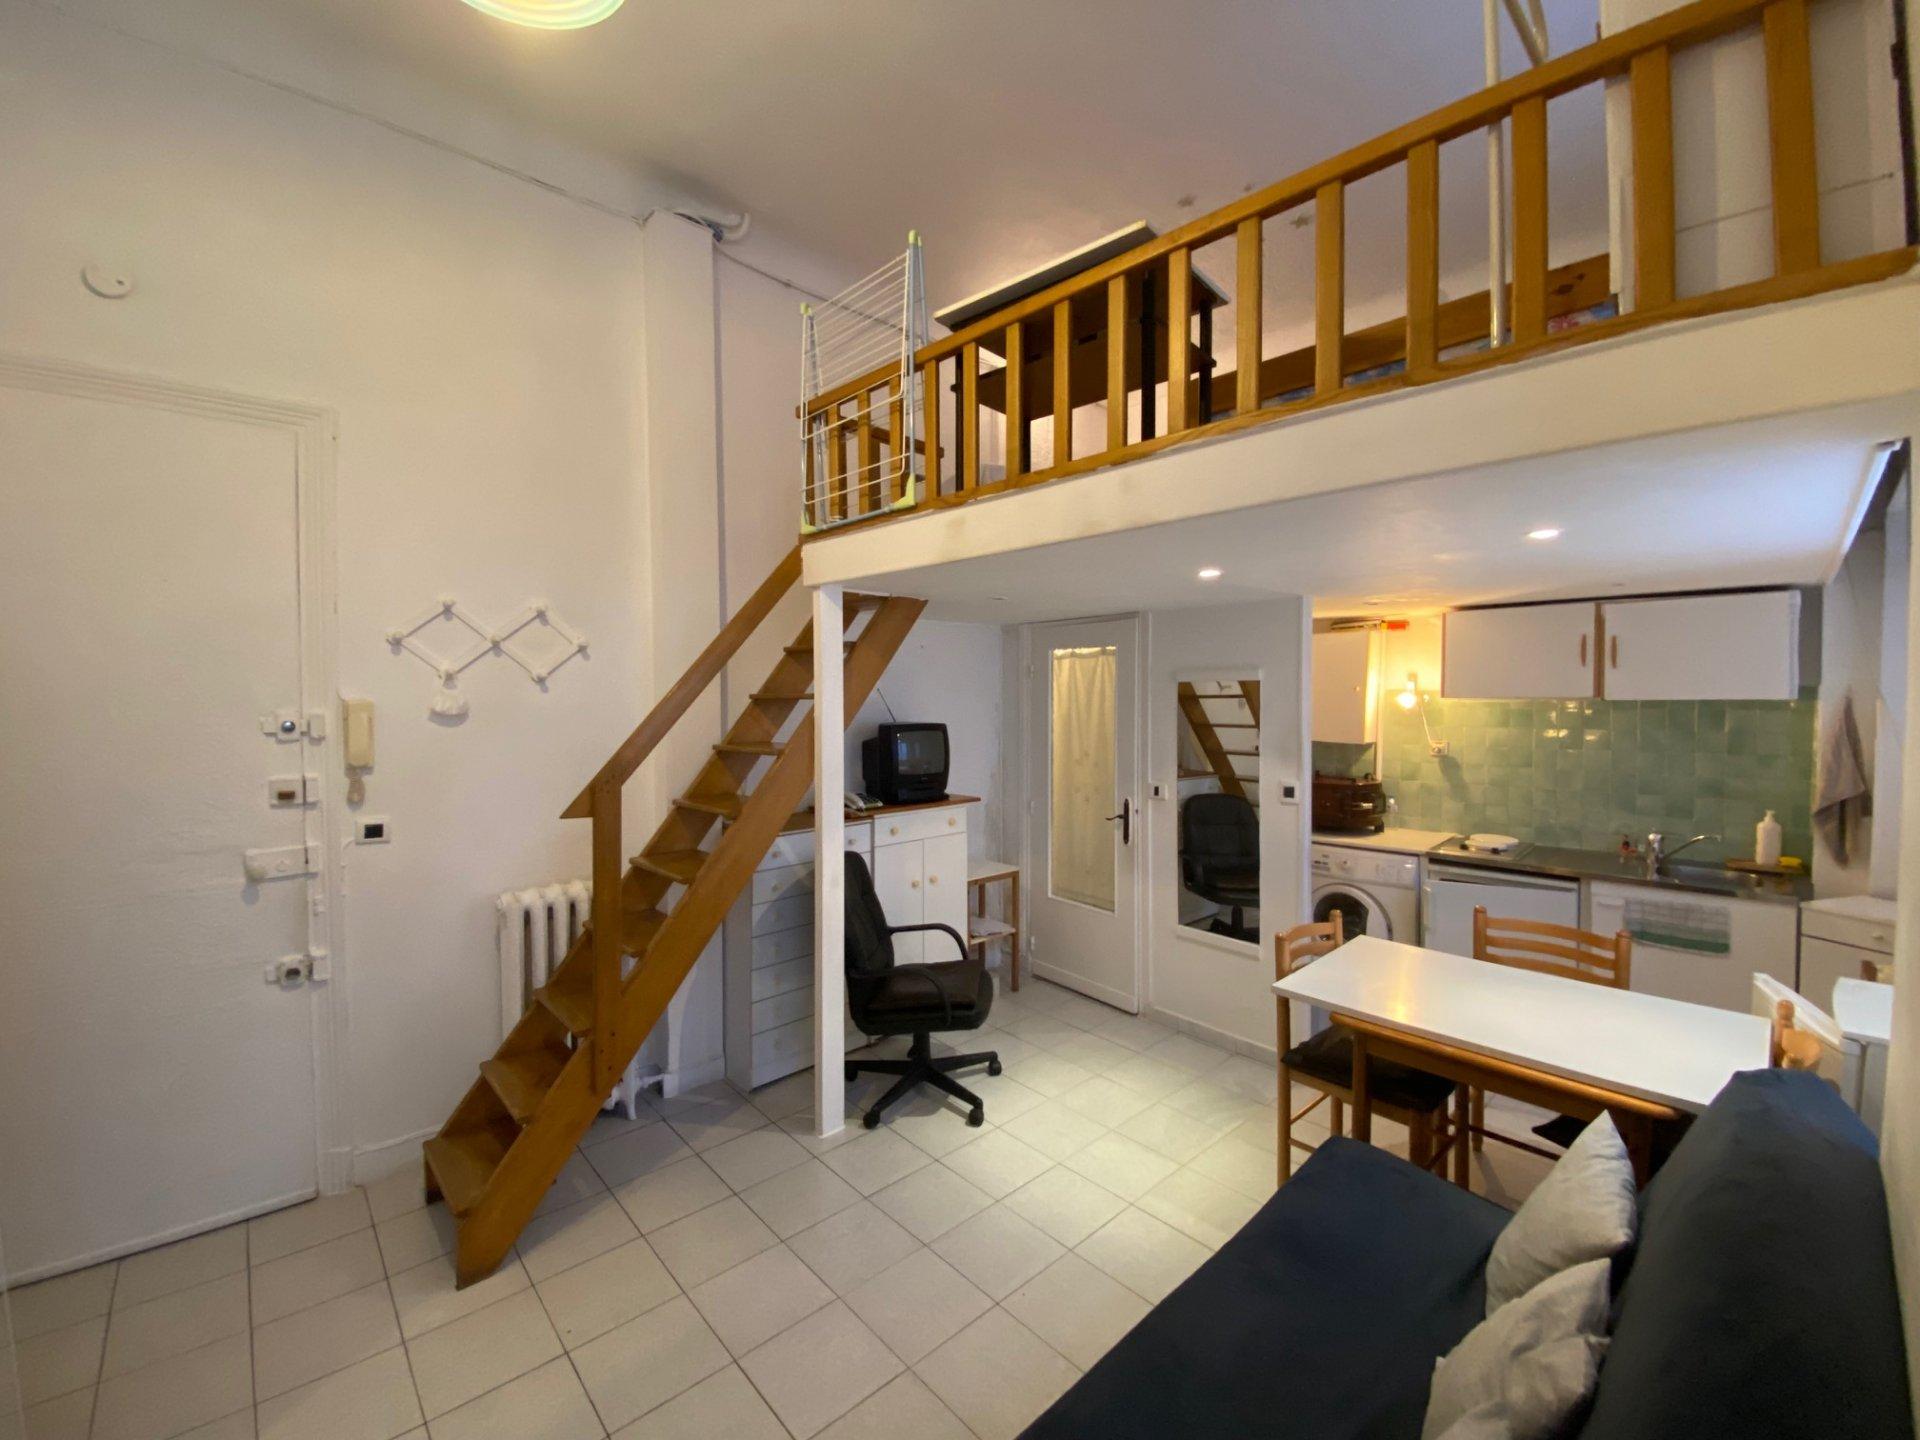 CARRE D'OR, Studio avec mezzanine